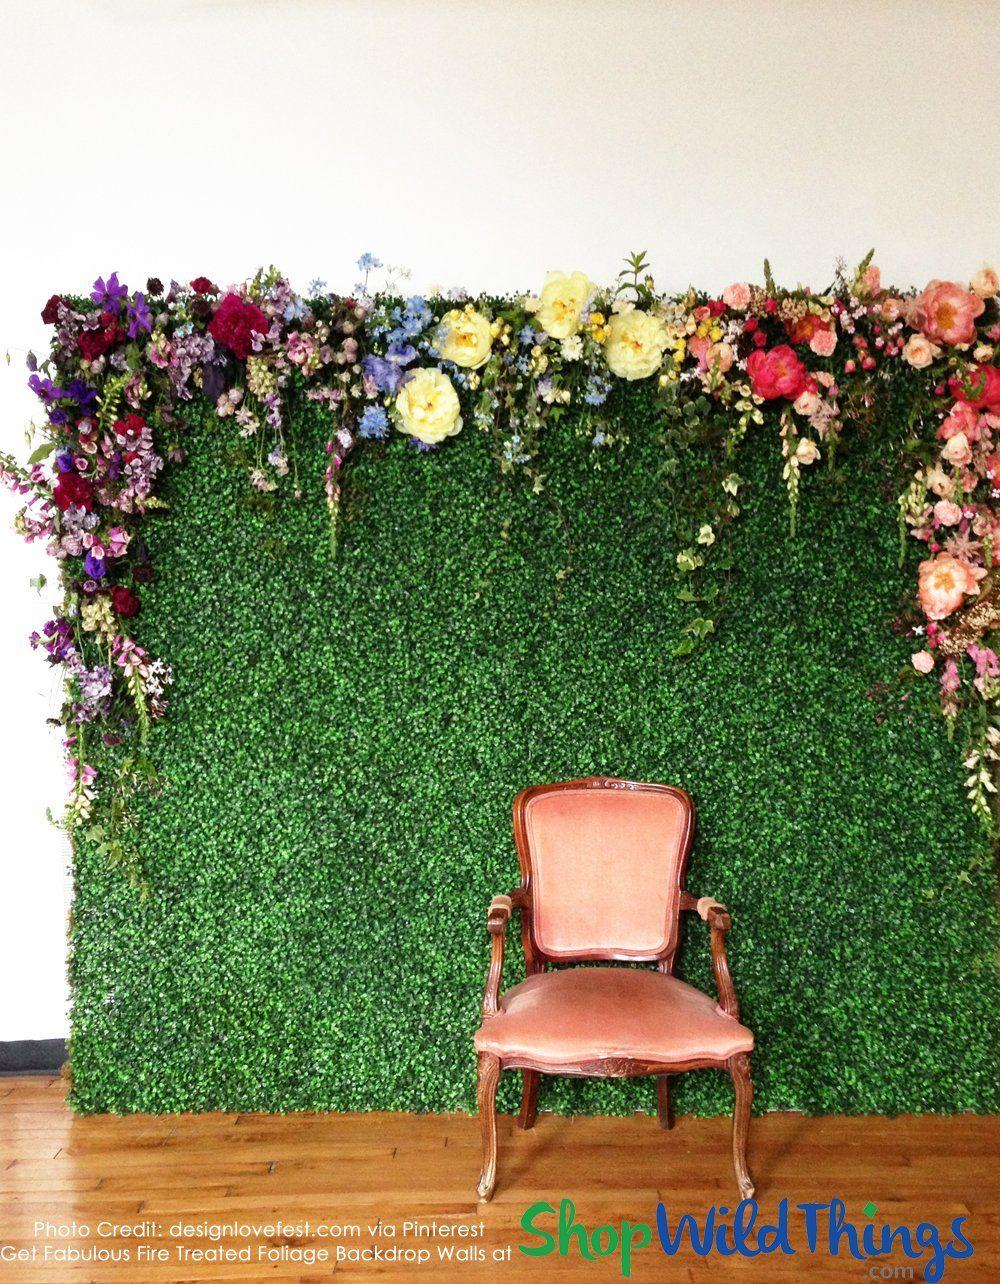 Artificial Greenery & Foliage Backdrops Backdrops for